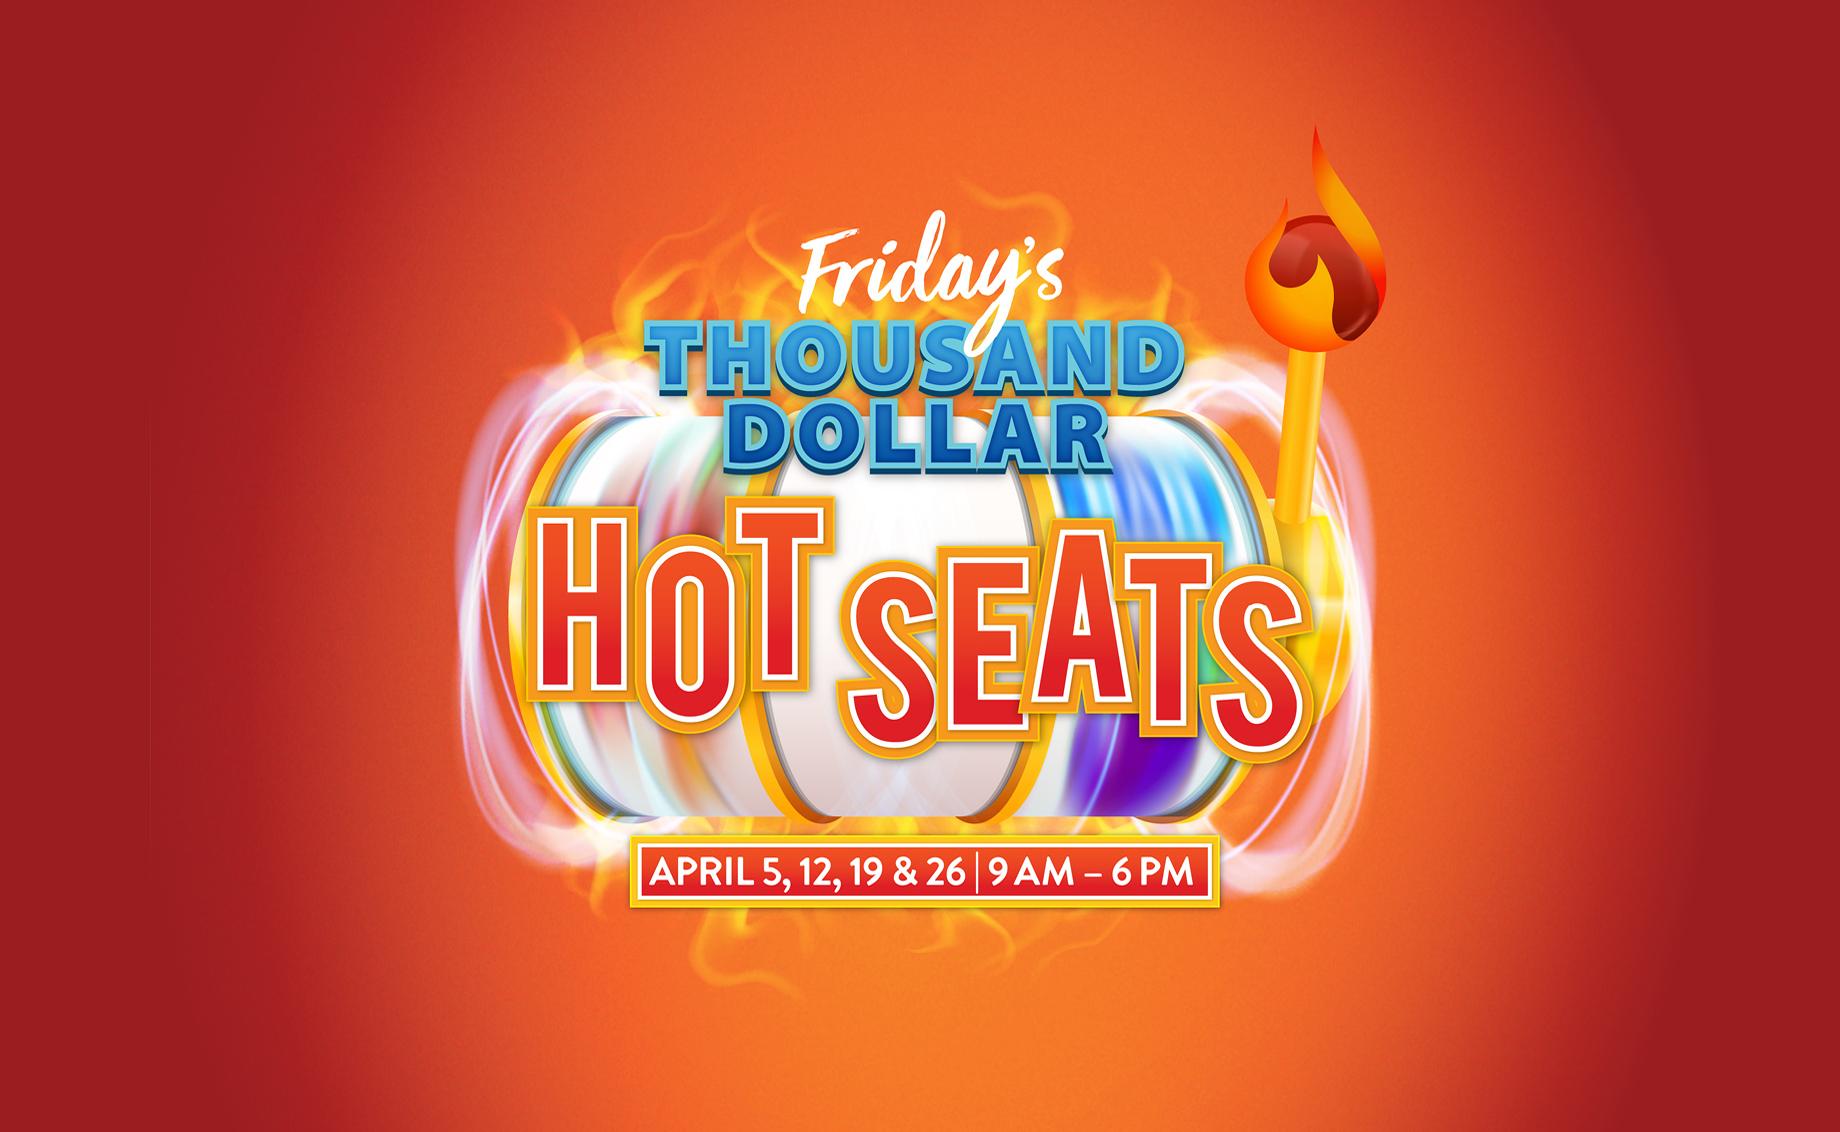 Friday's Thousand Dollar Hot Seats